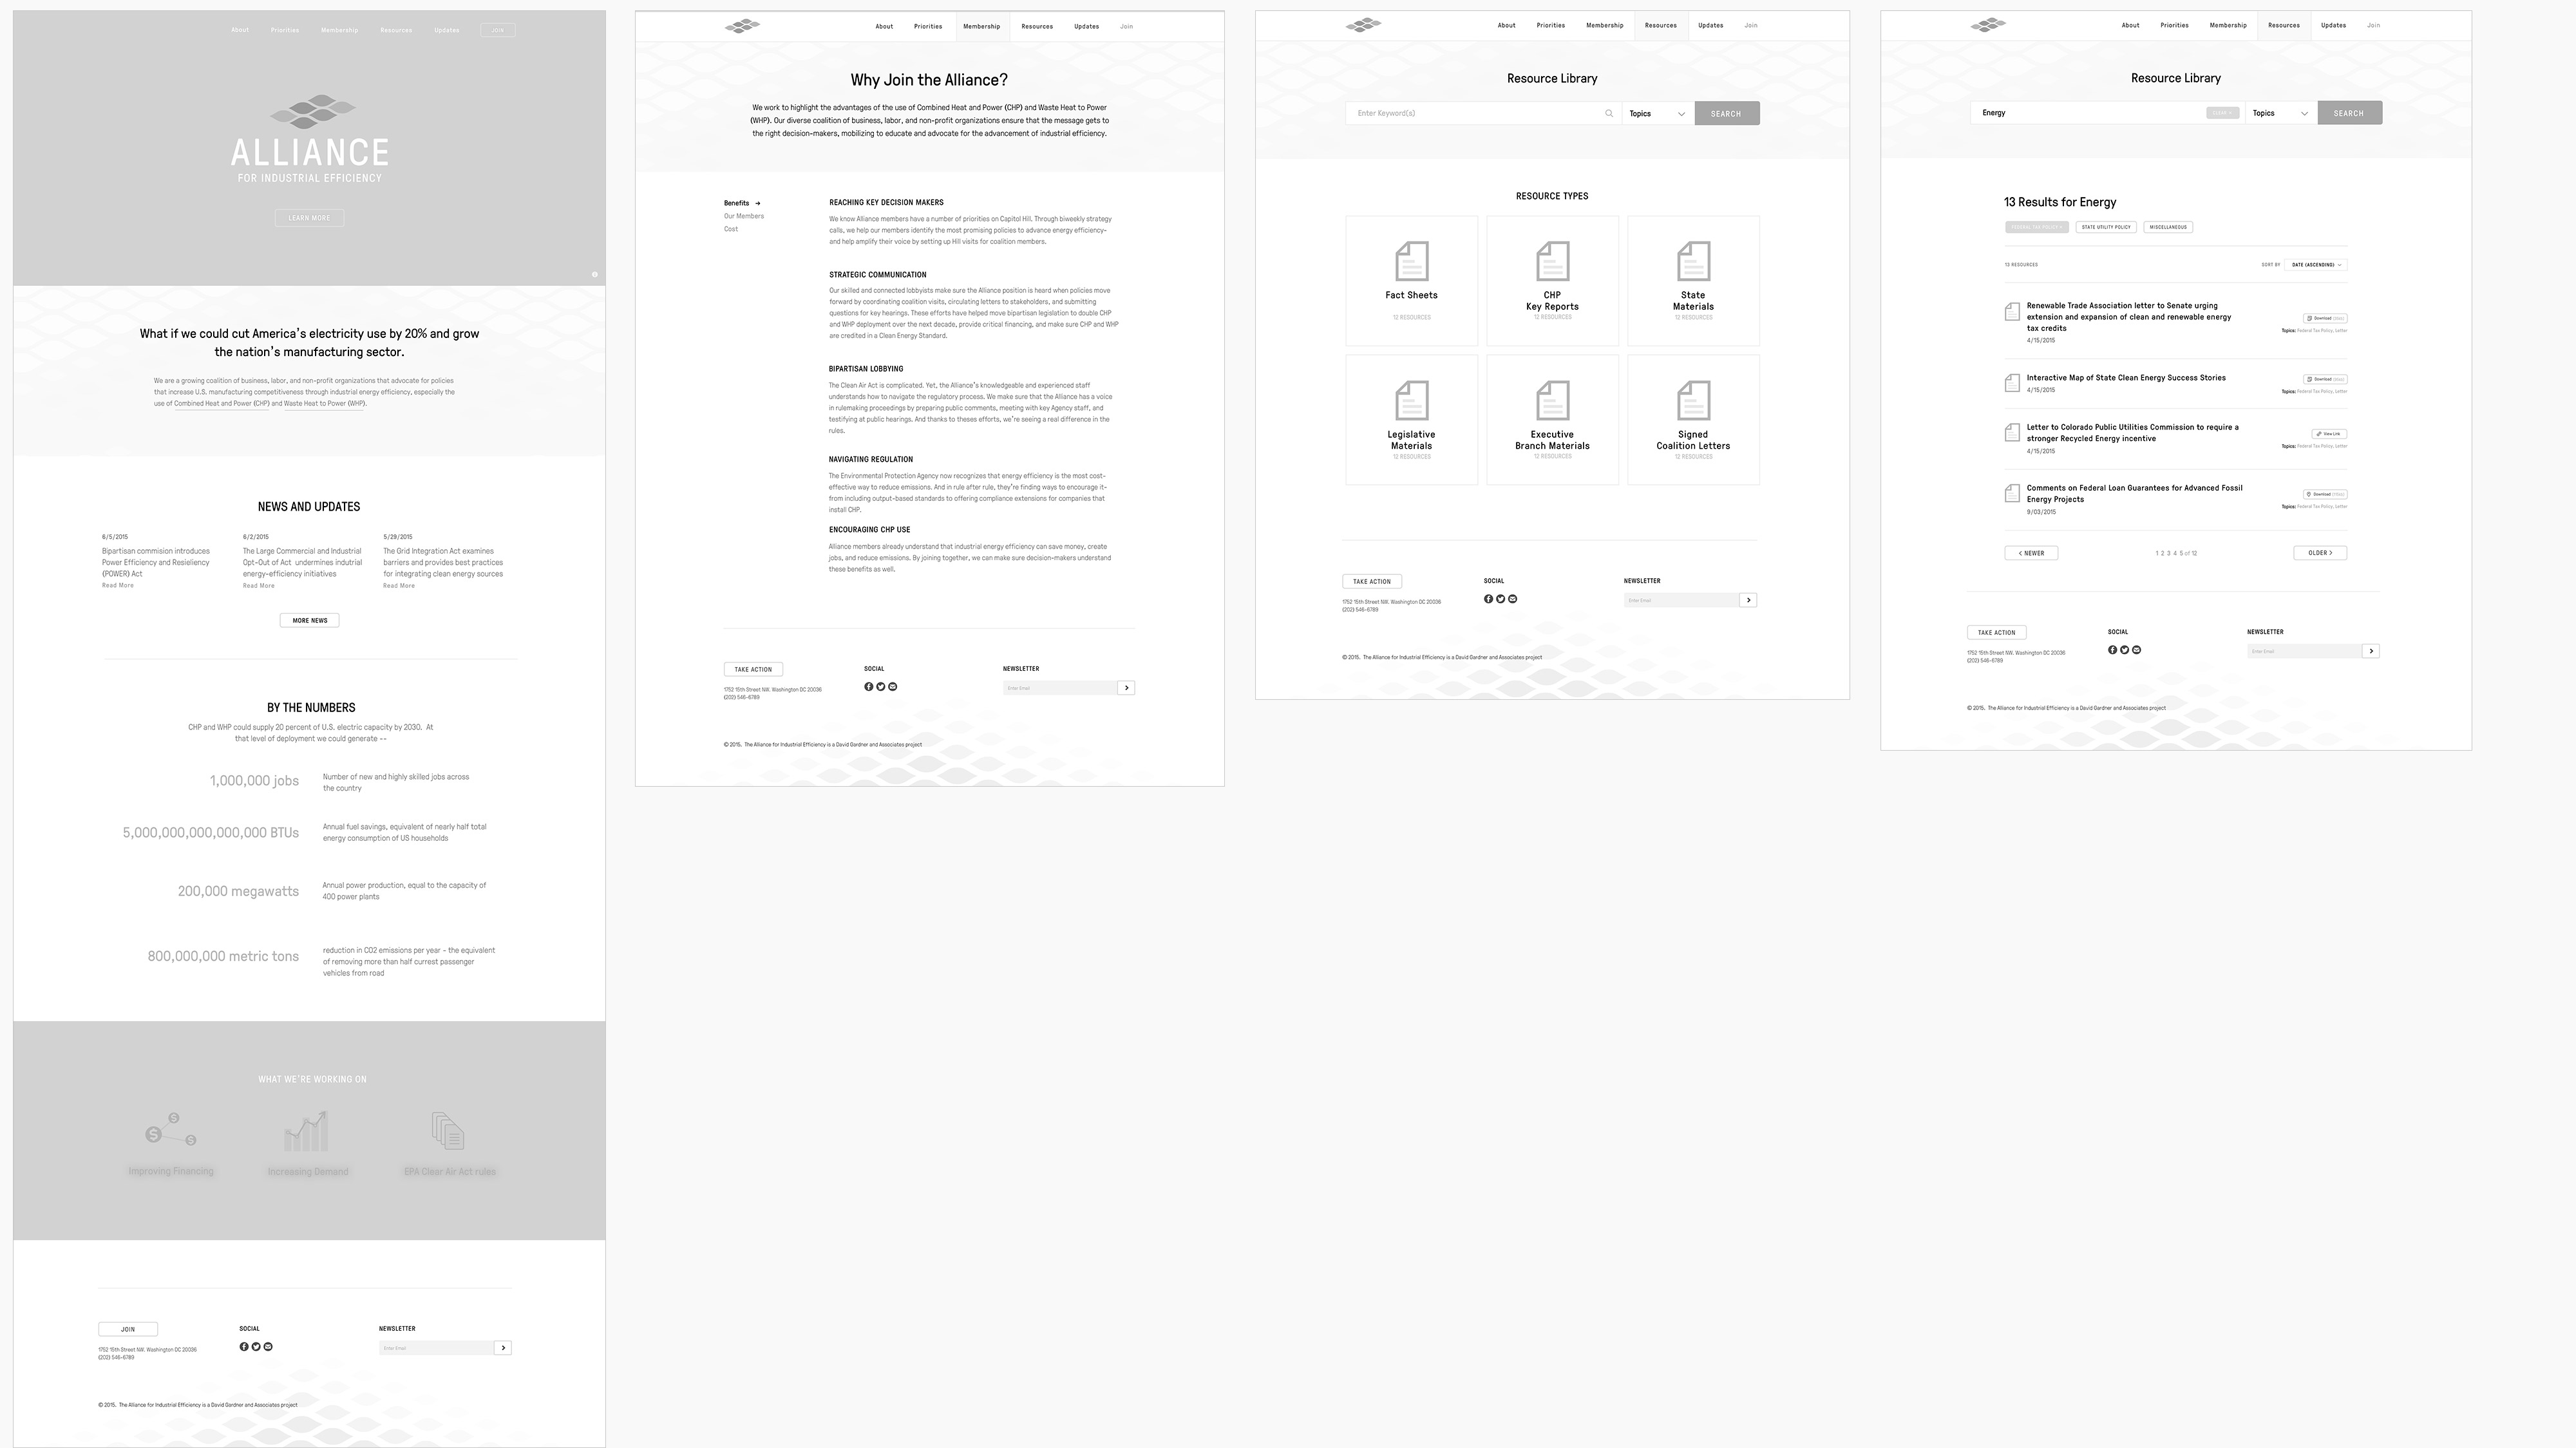 alliance-stationery-web-process-16x9